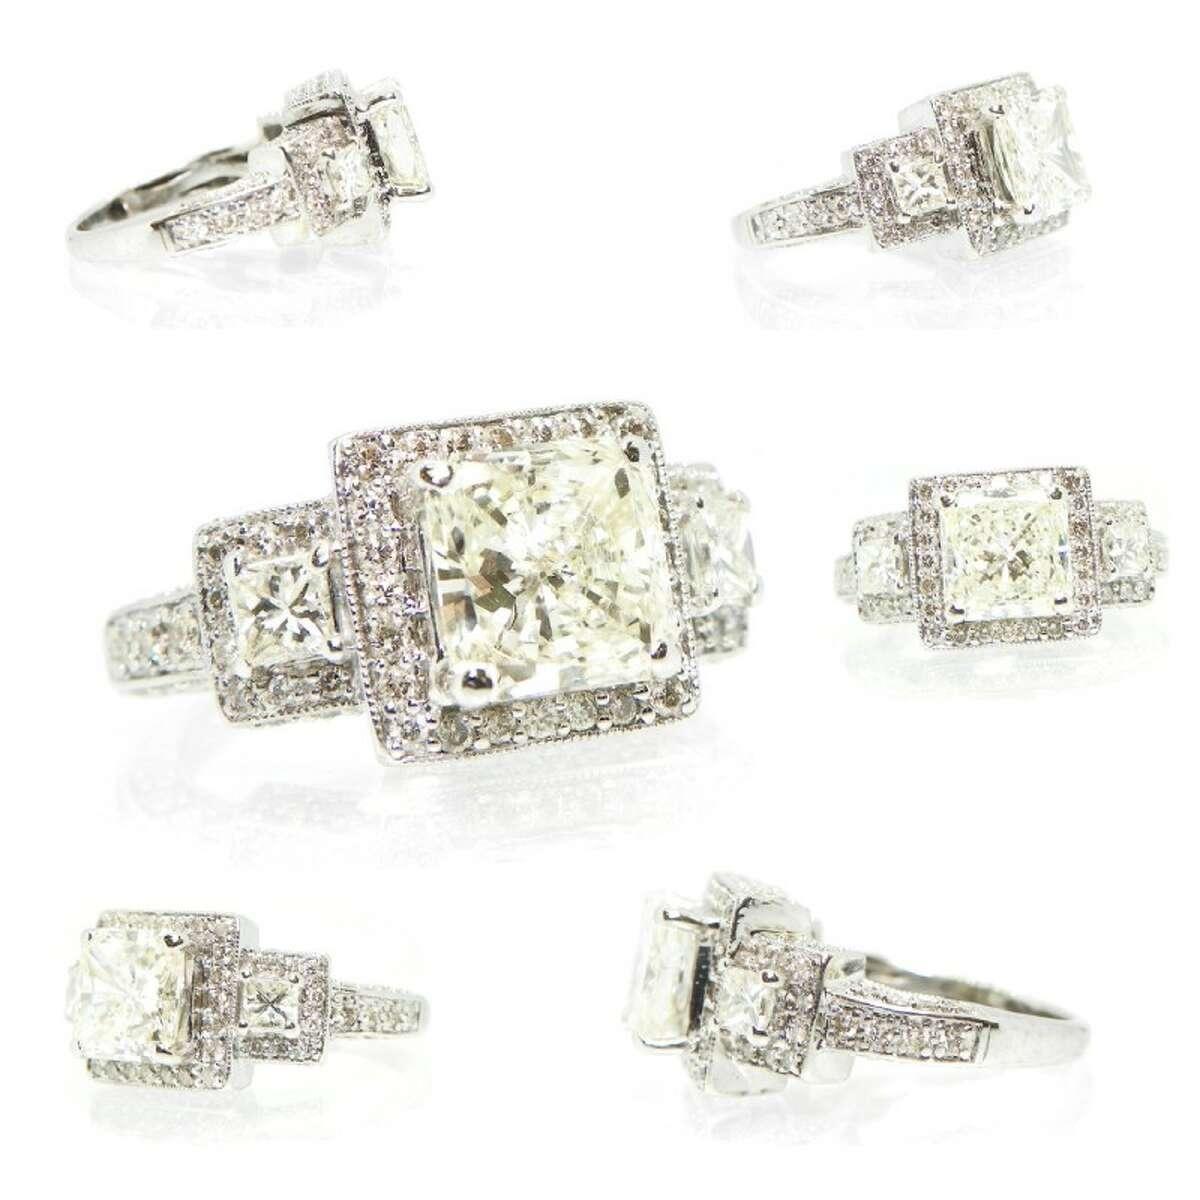 MSRP $31K+ 14K WG 2.59ctw Diamond Ring Sz 4 Price: $7,455.00